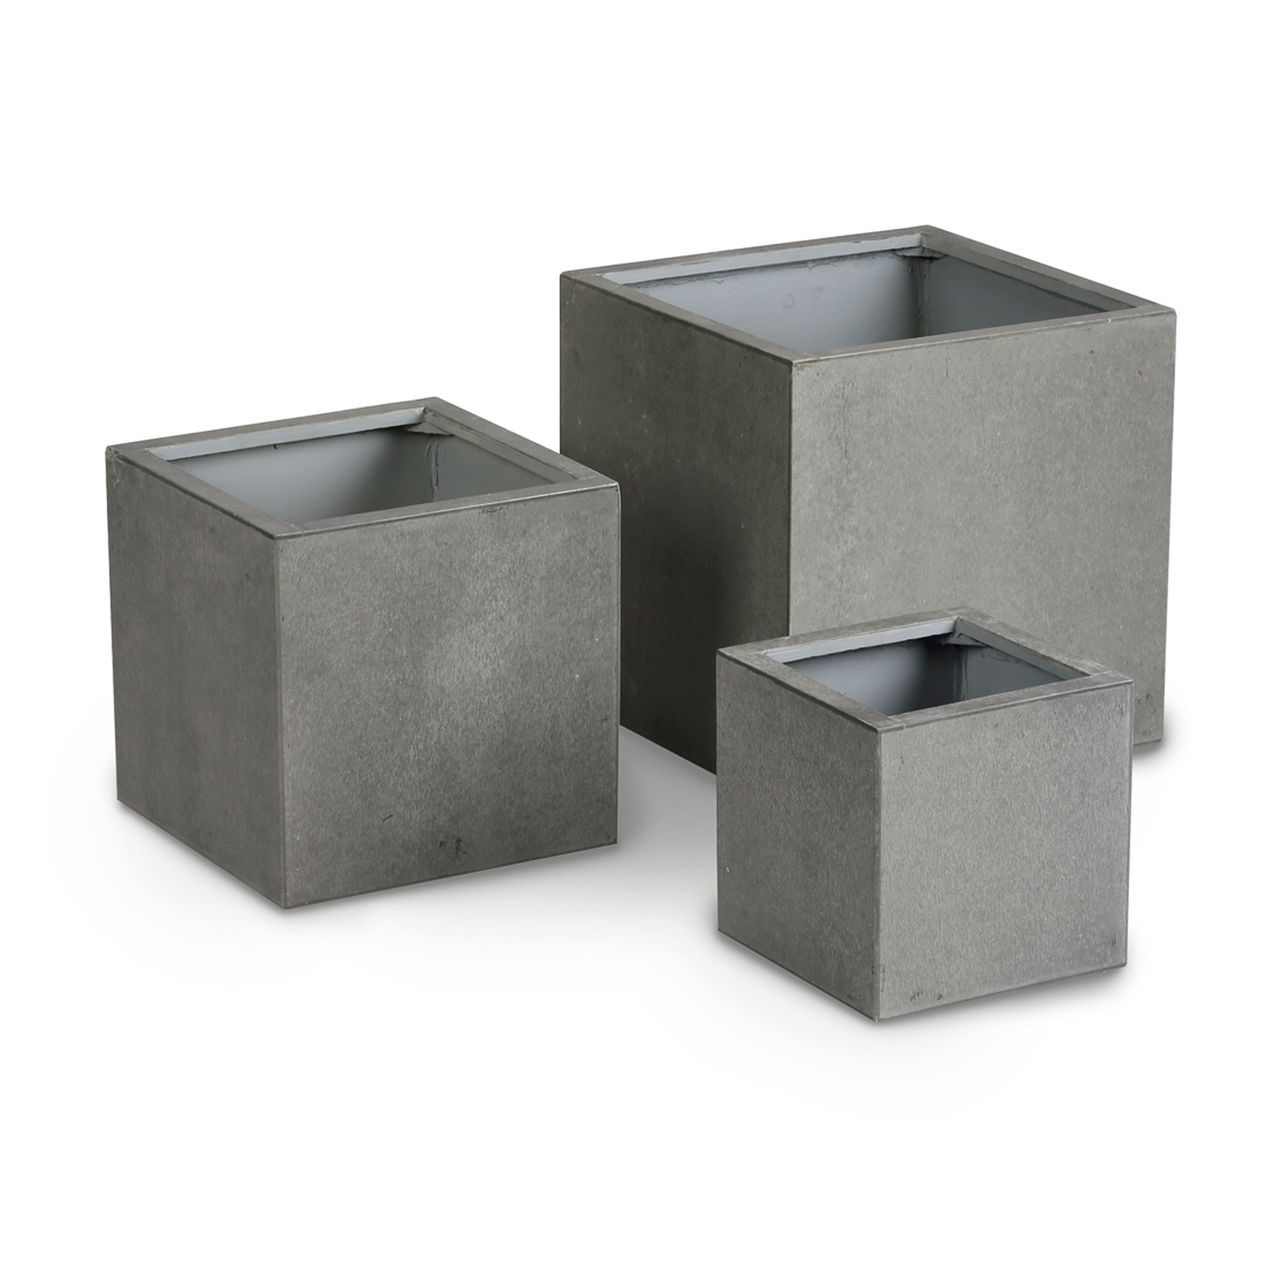 "pflanzkübel ""rockall"" im ästhetischen beton-look - absolut"